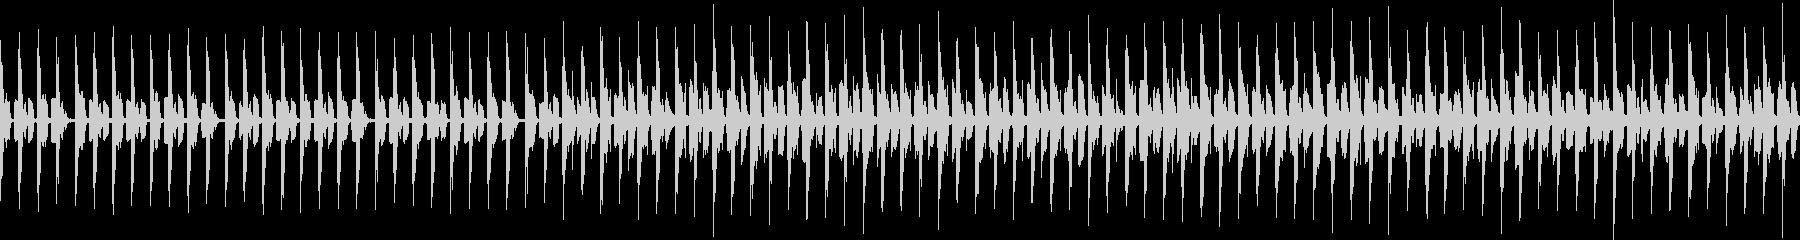 (Loop)マイルドめなエレクトロポップの未再生の波形